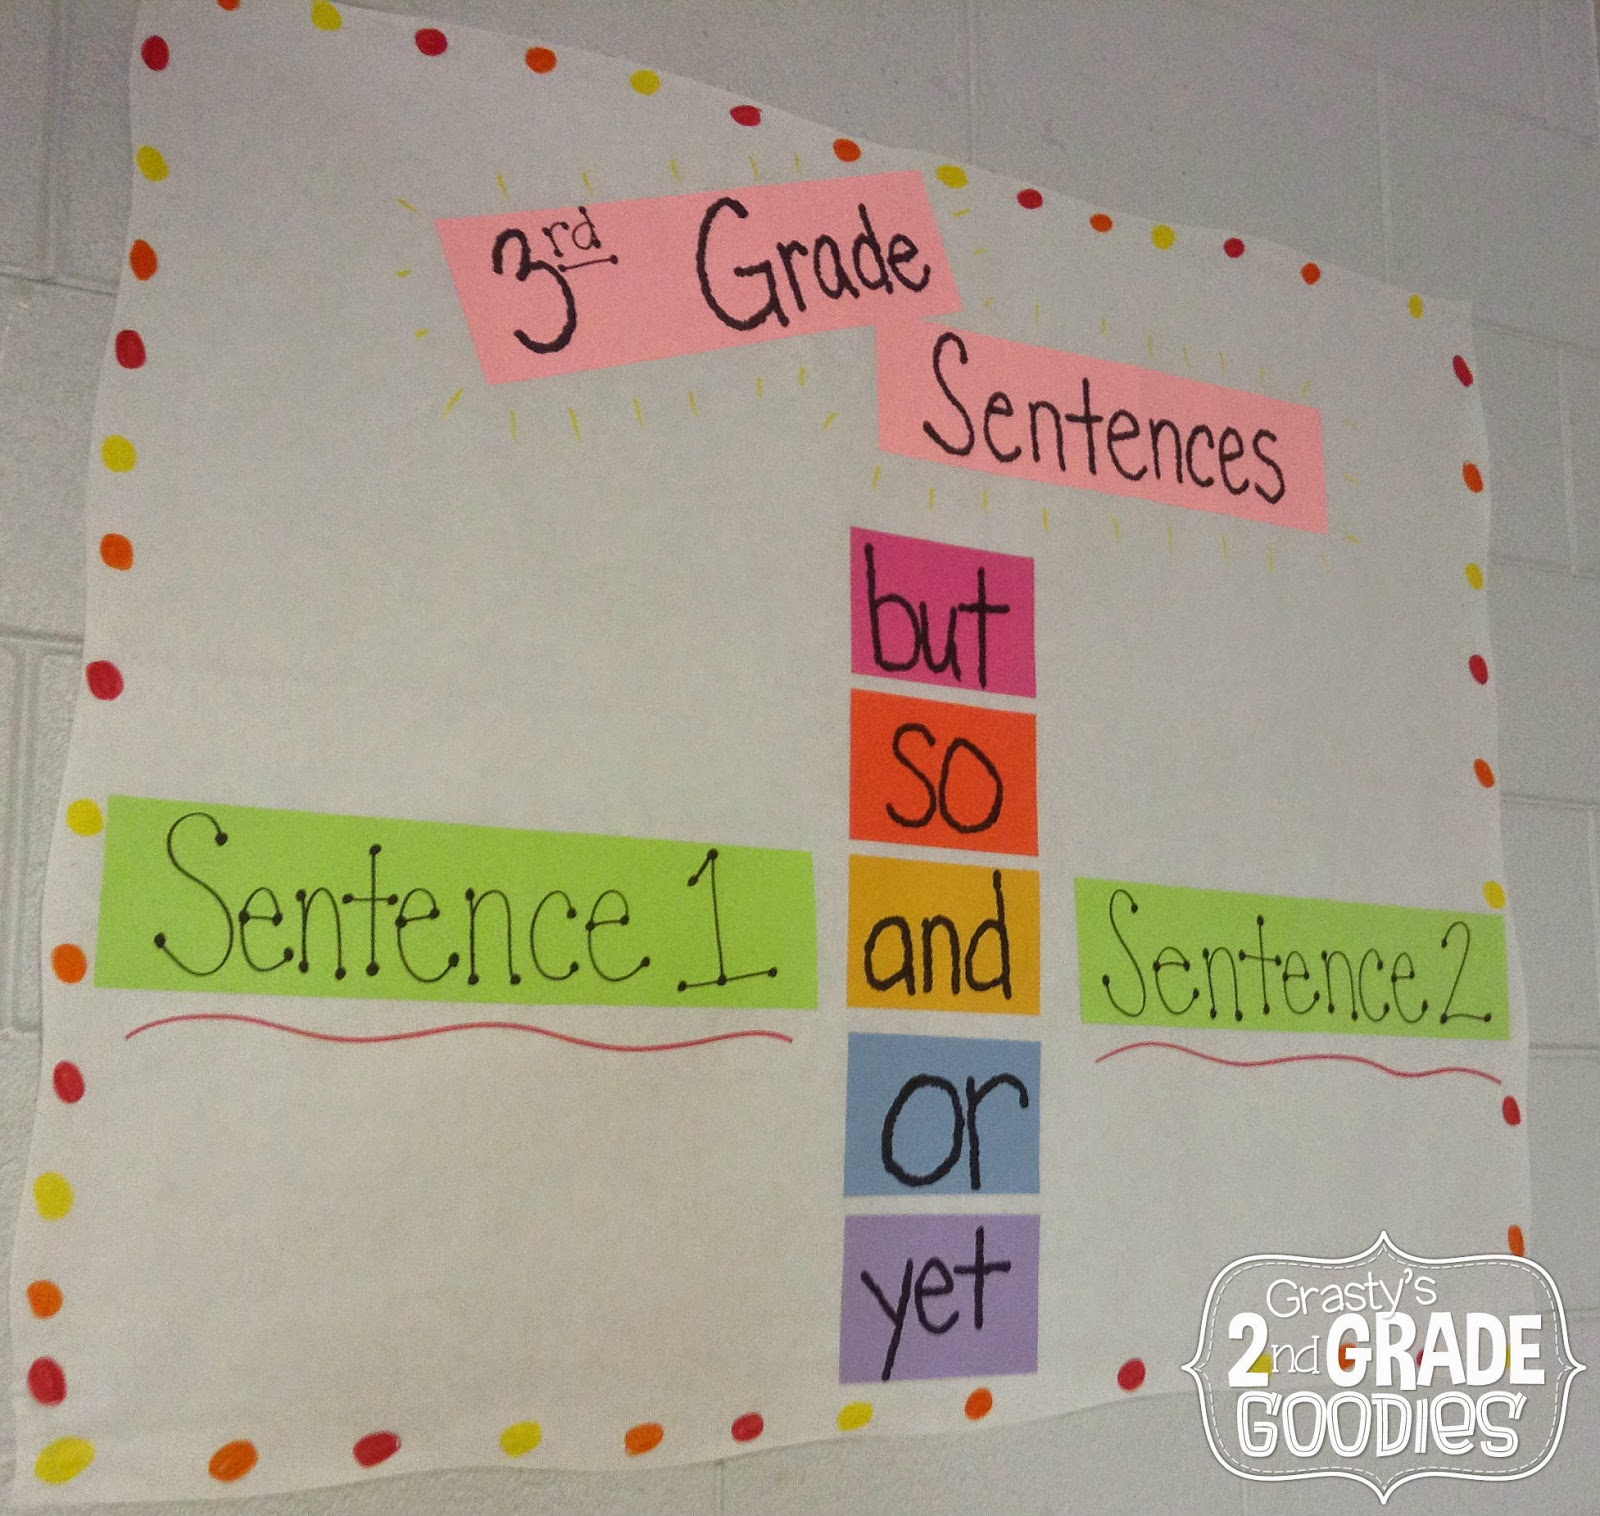 Grasty S 2nd Grade Goo S Writing Compound Sentences Can